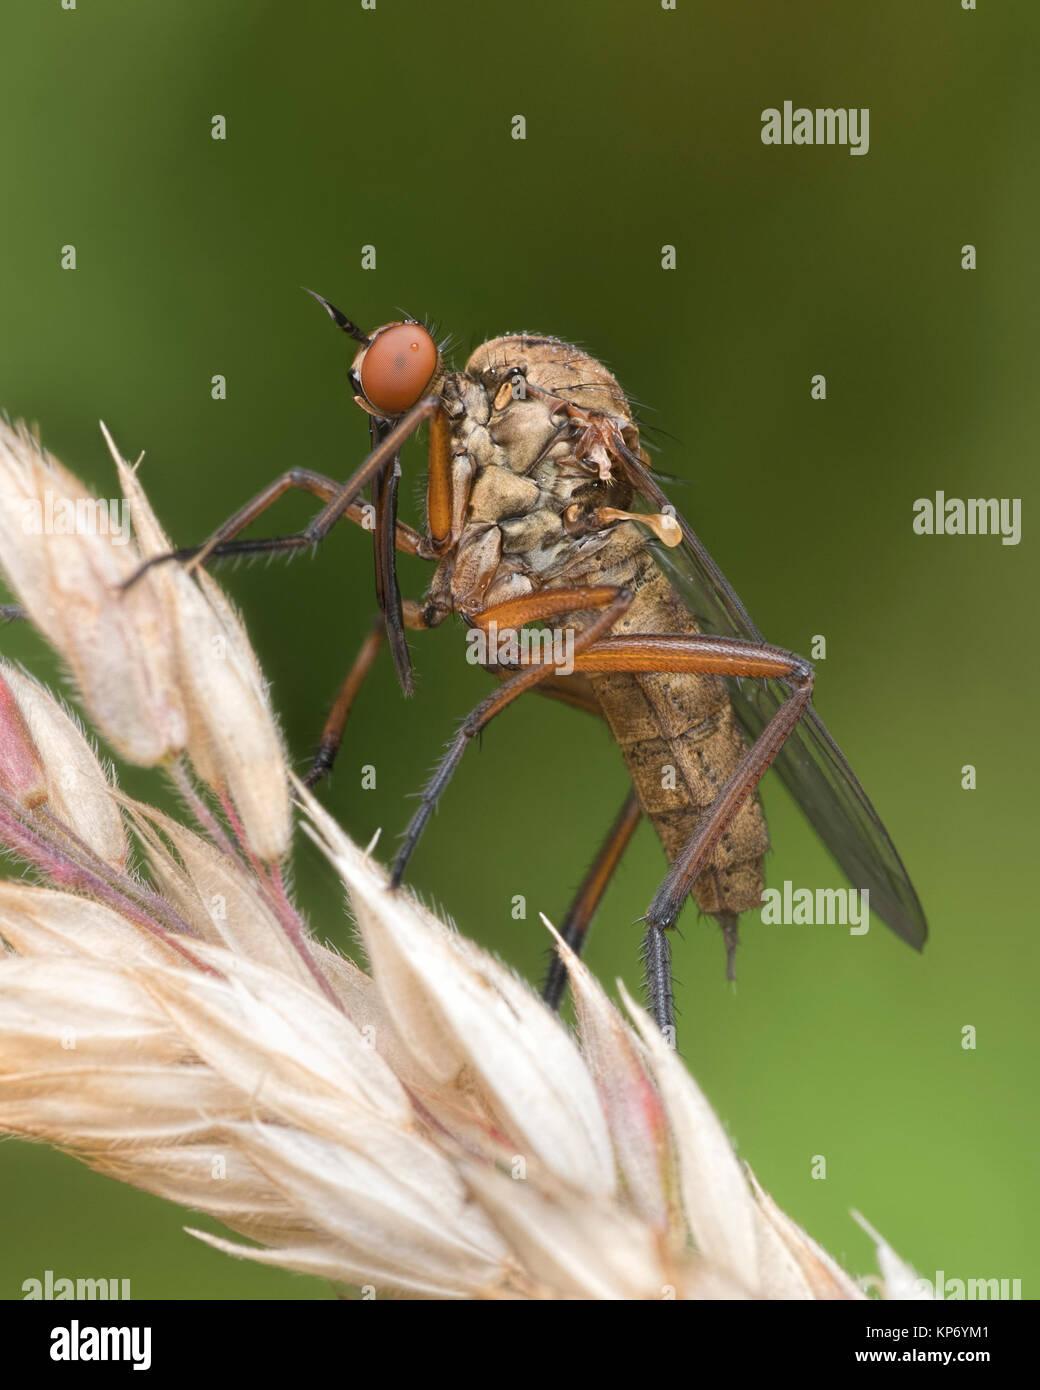 Daggerfly (Empis sp.) on grass. Knockavilla, Tipperary, Ireland. - Stock Image